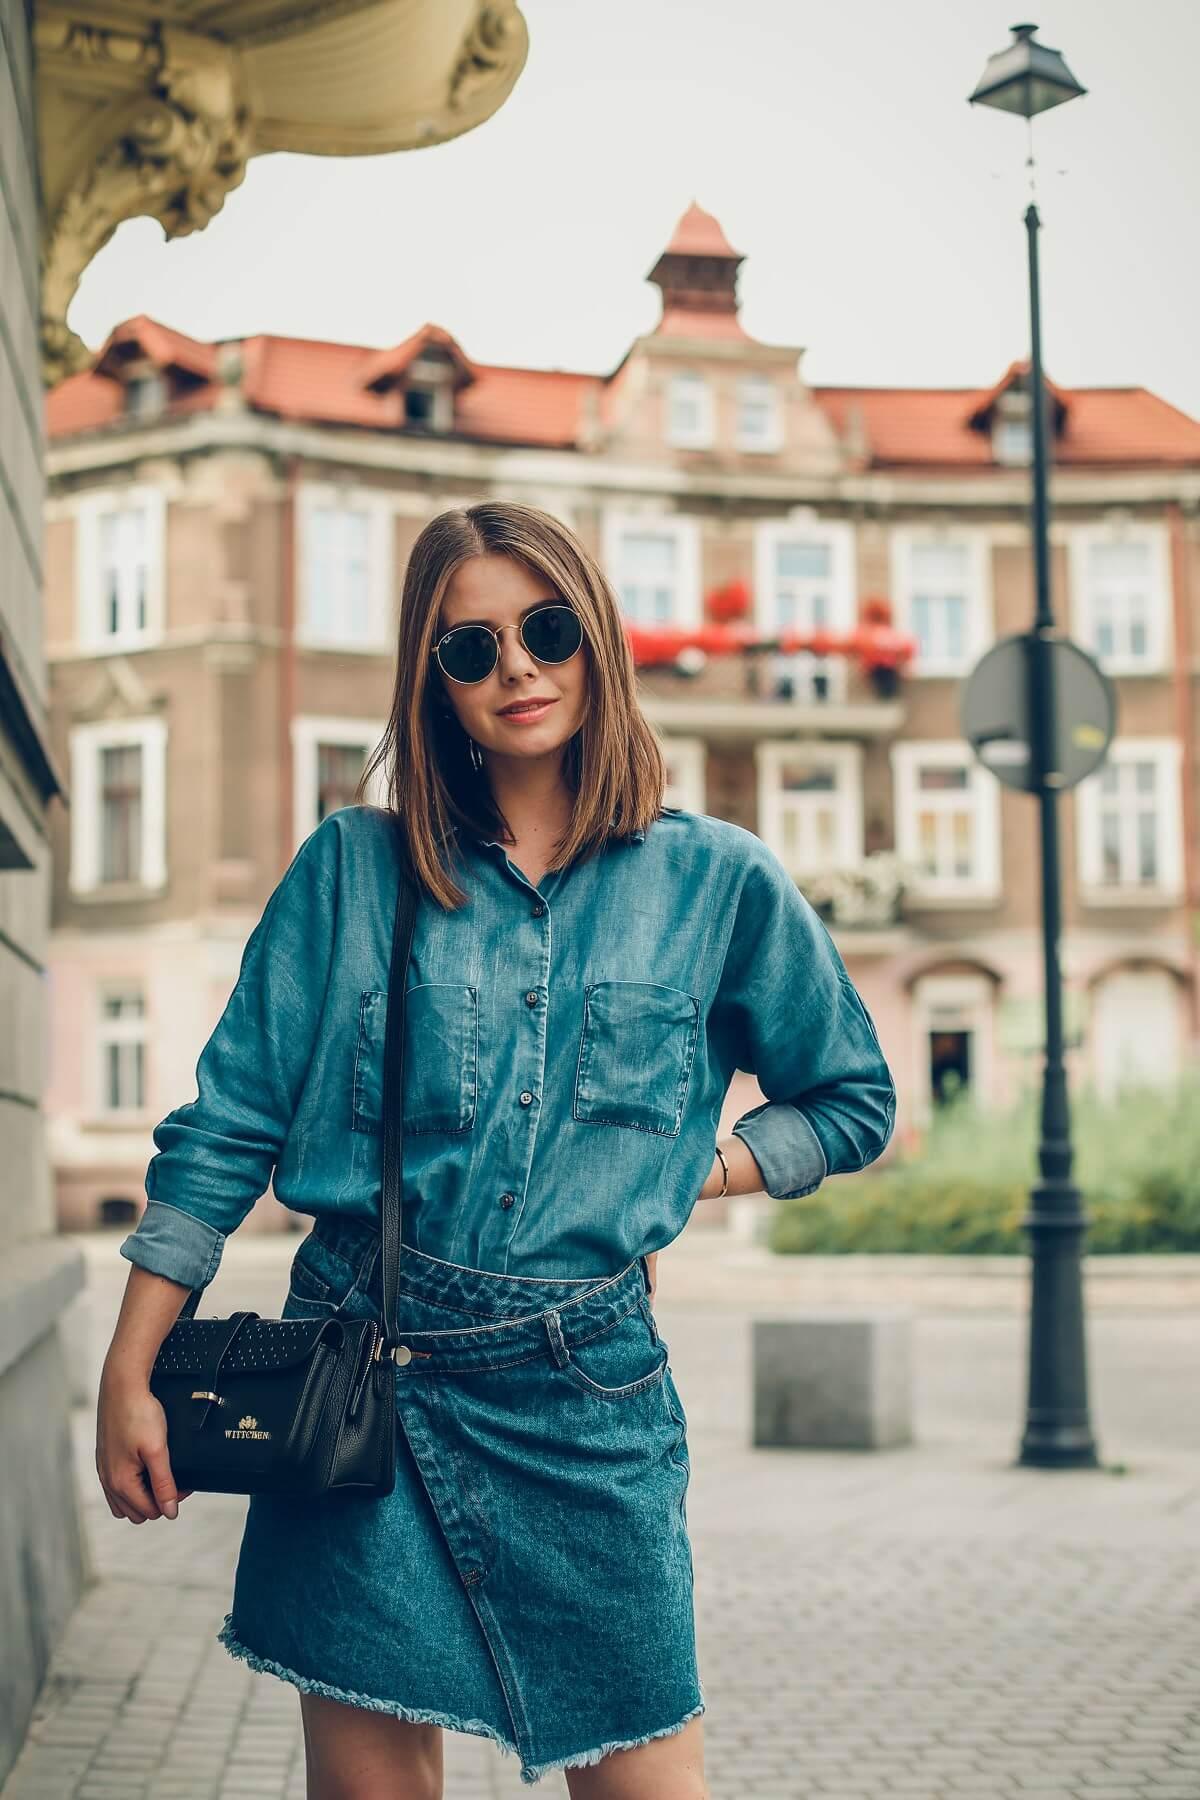 jeans total look torebka wittchen